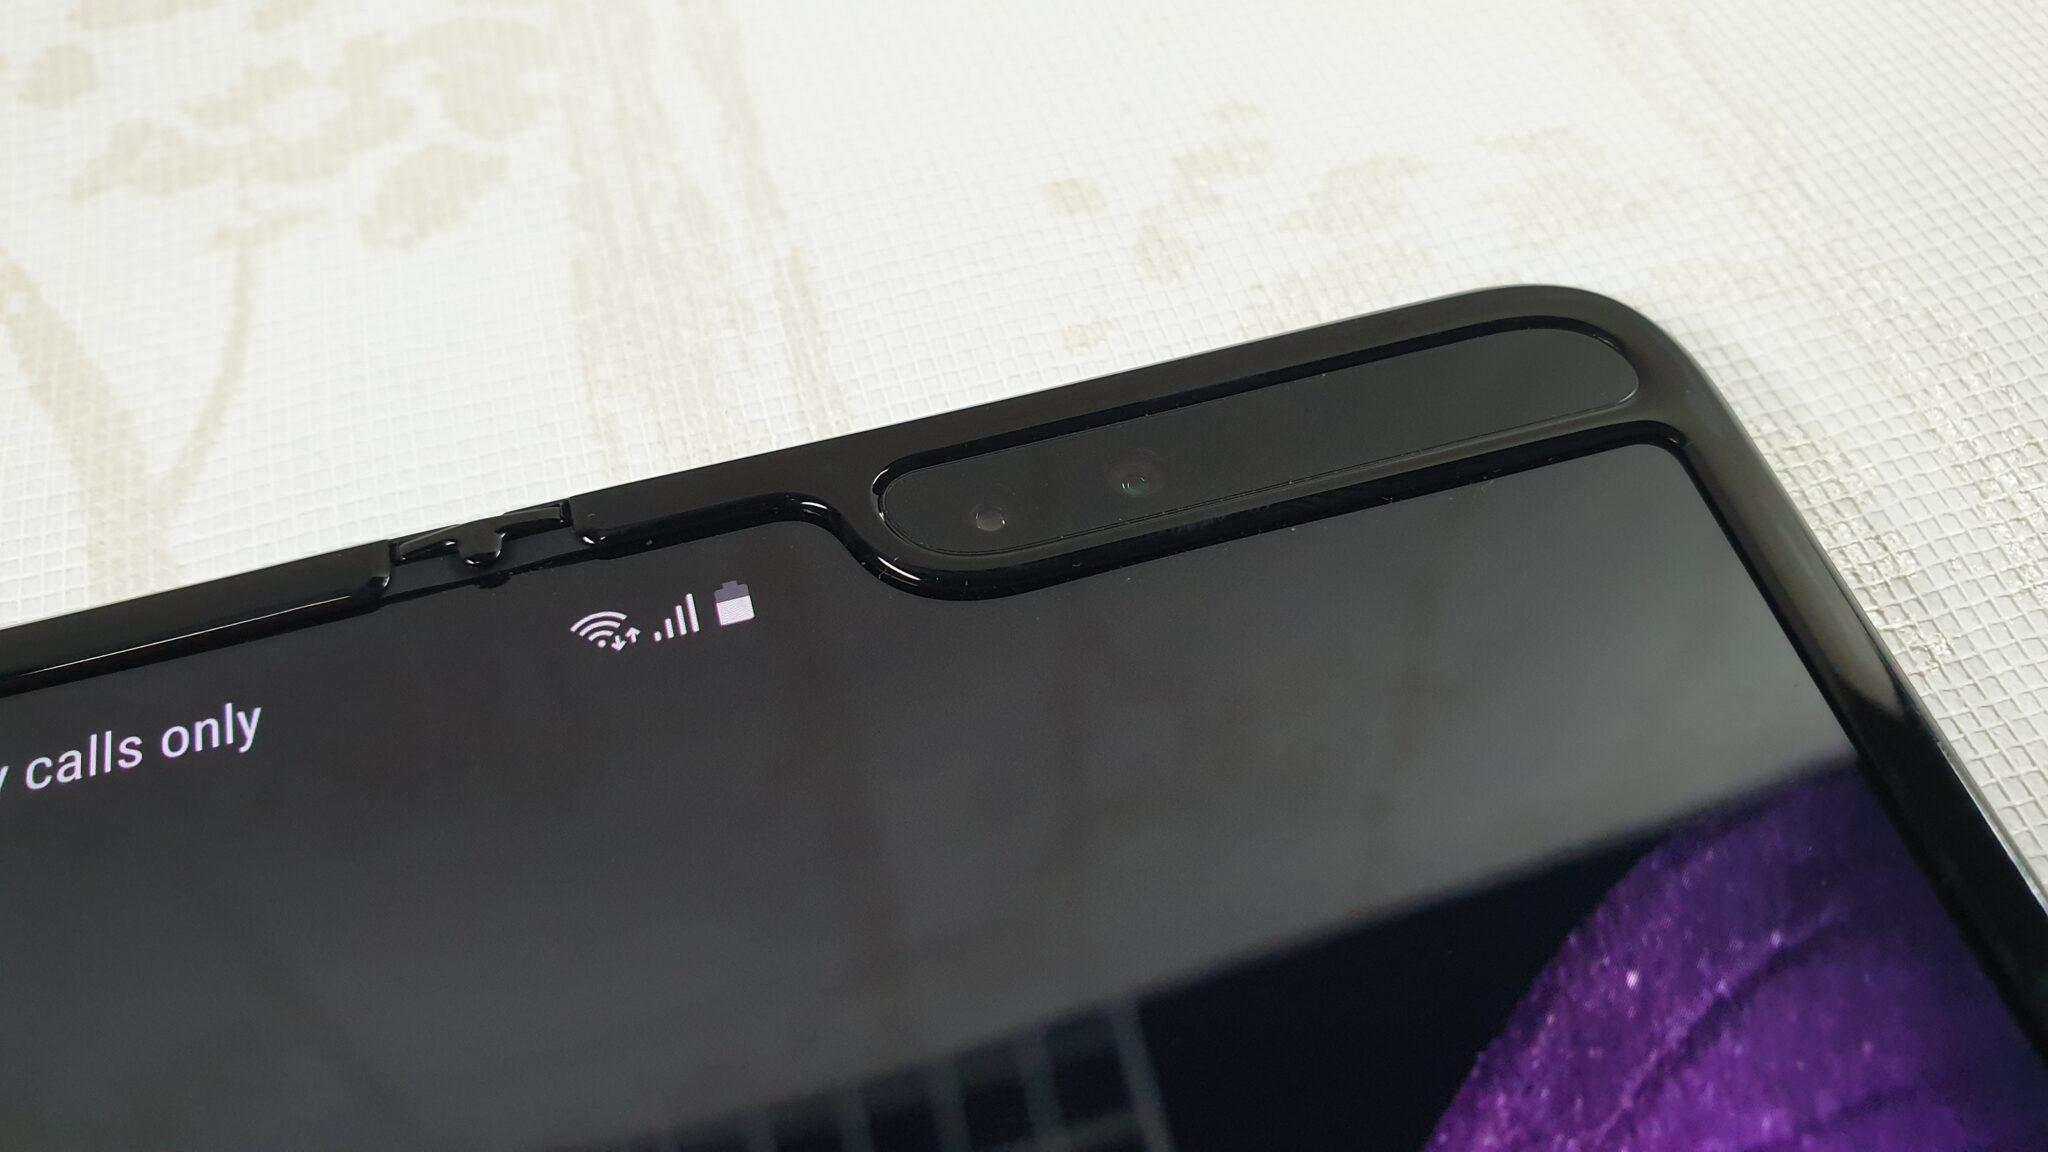 Galaxy Fold selfie cameras